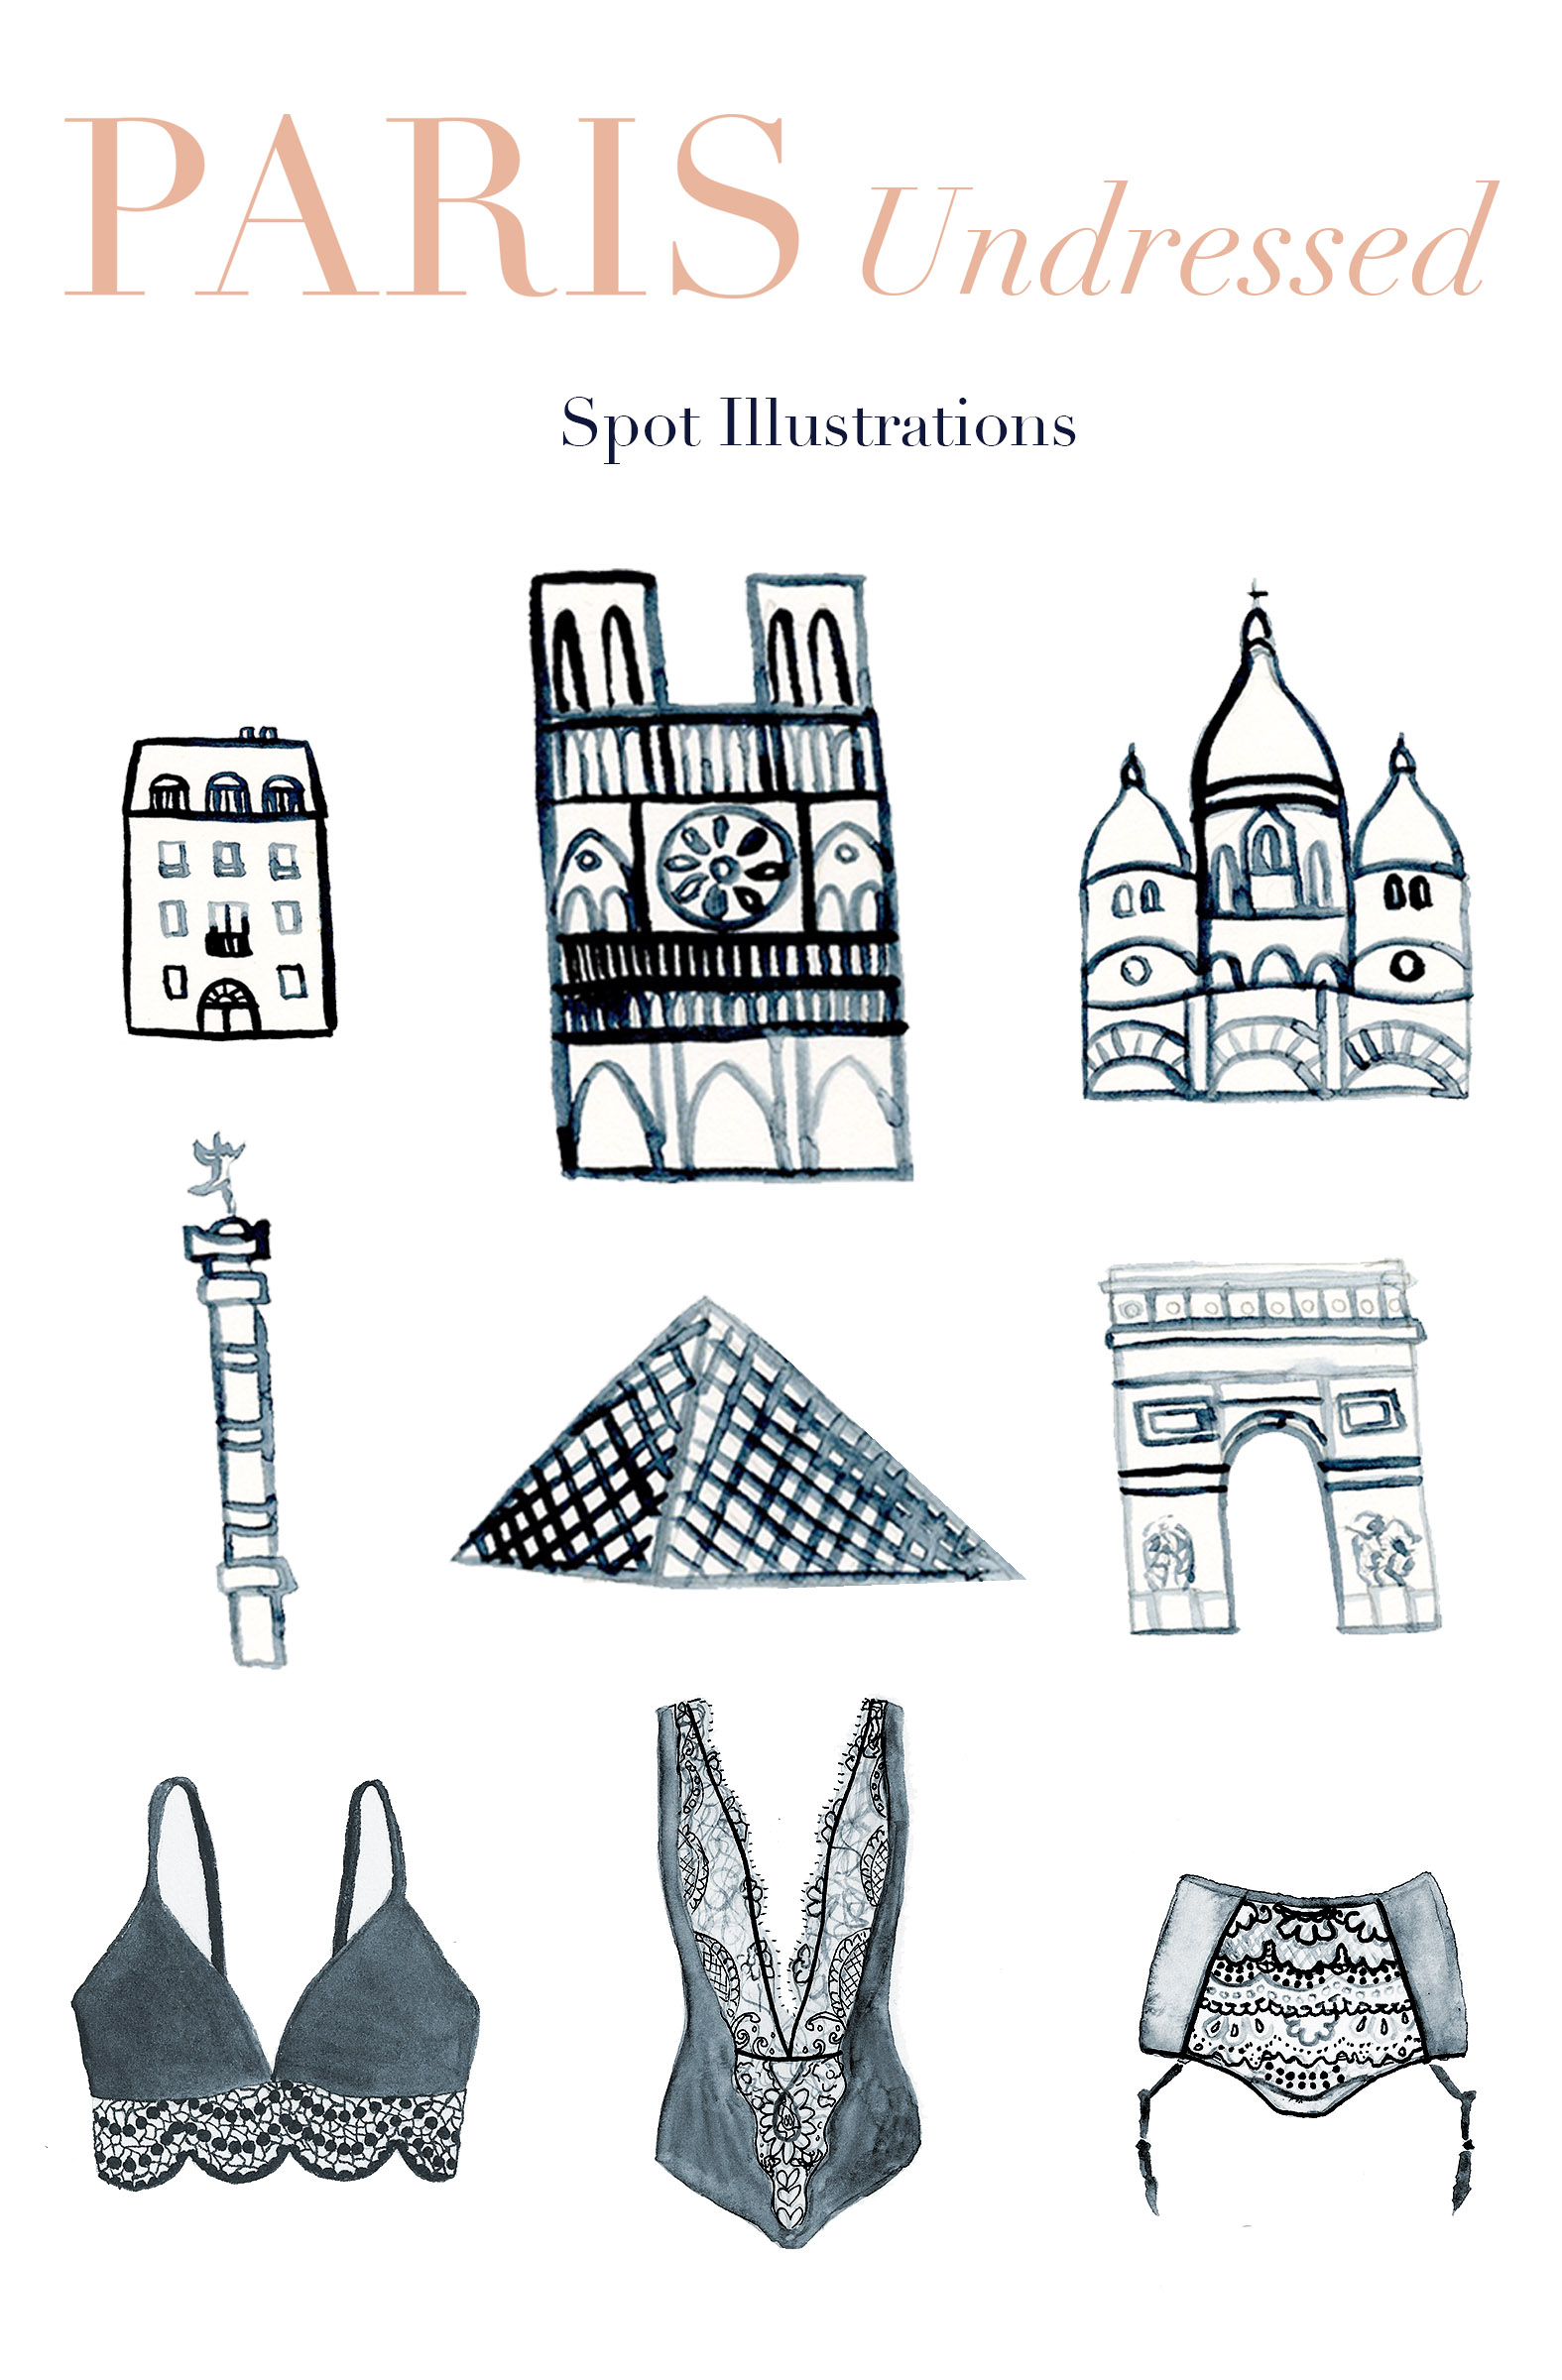 Paris Undresed Spot Illustrations Elle Powell.jpg